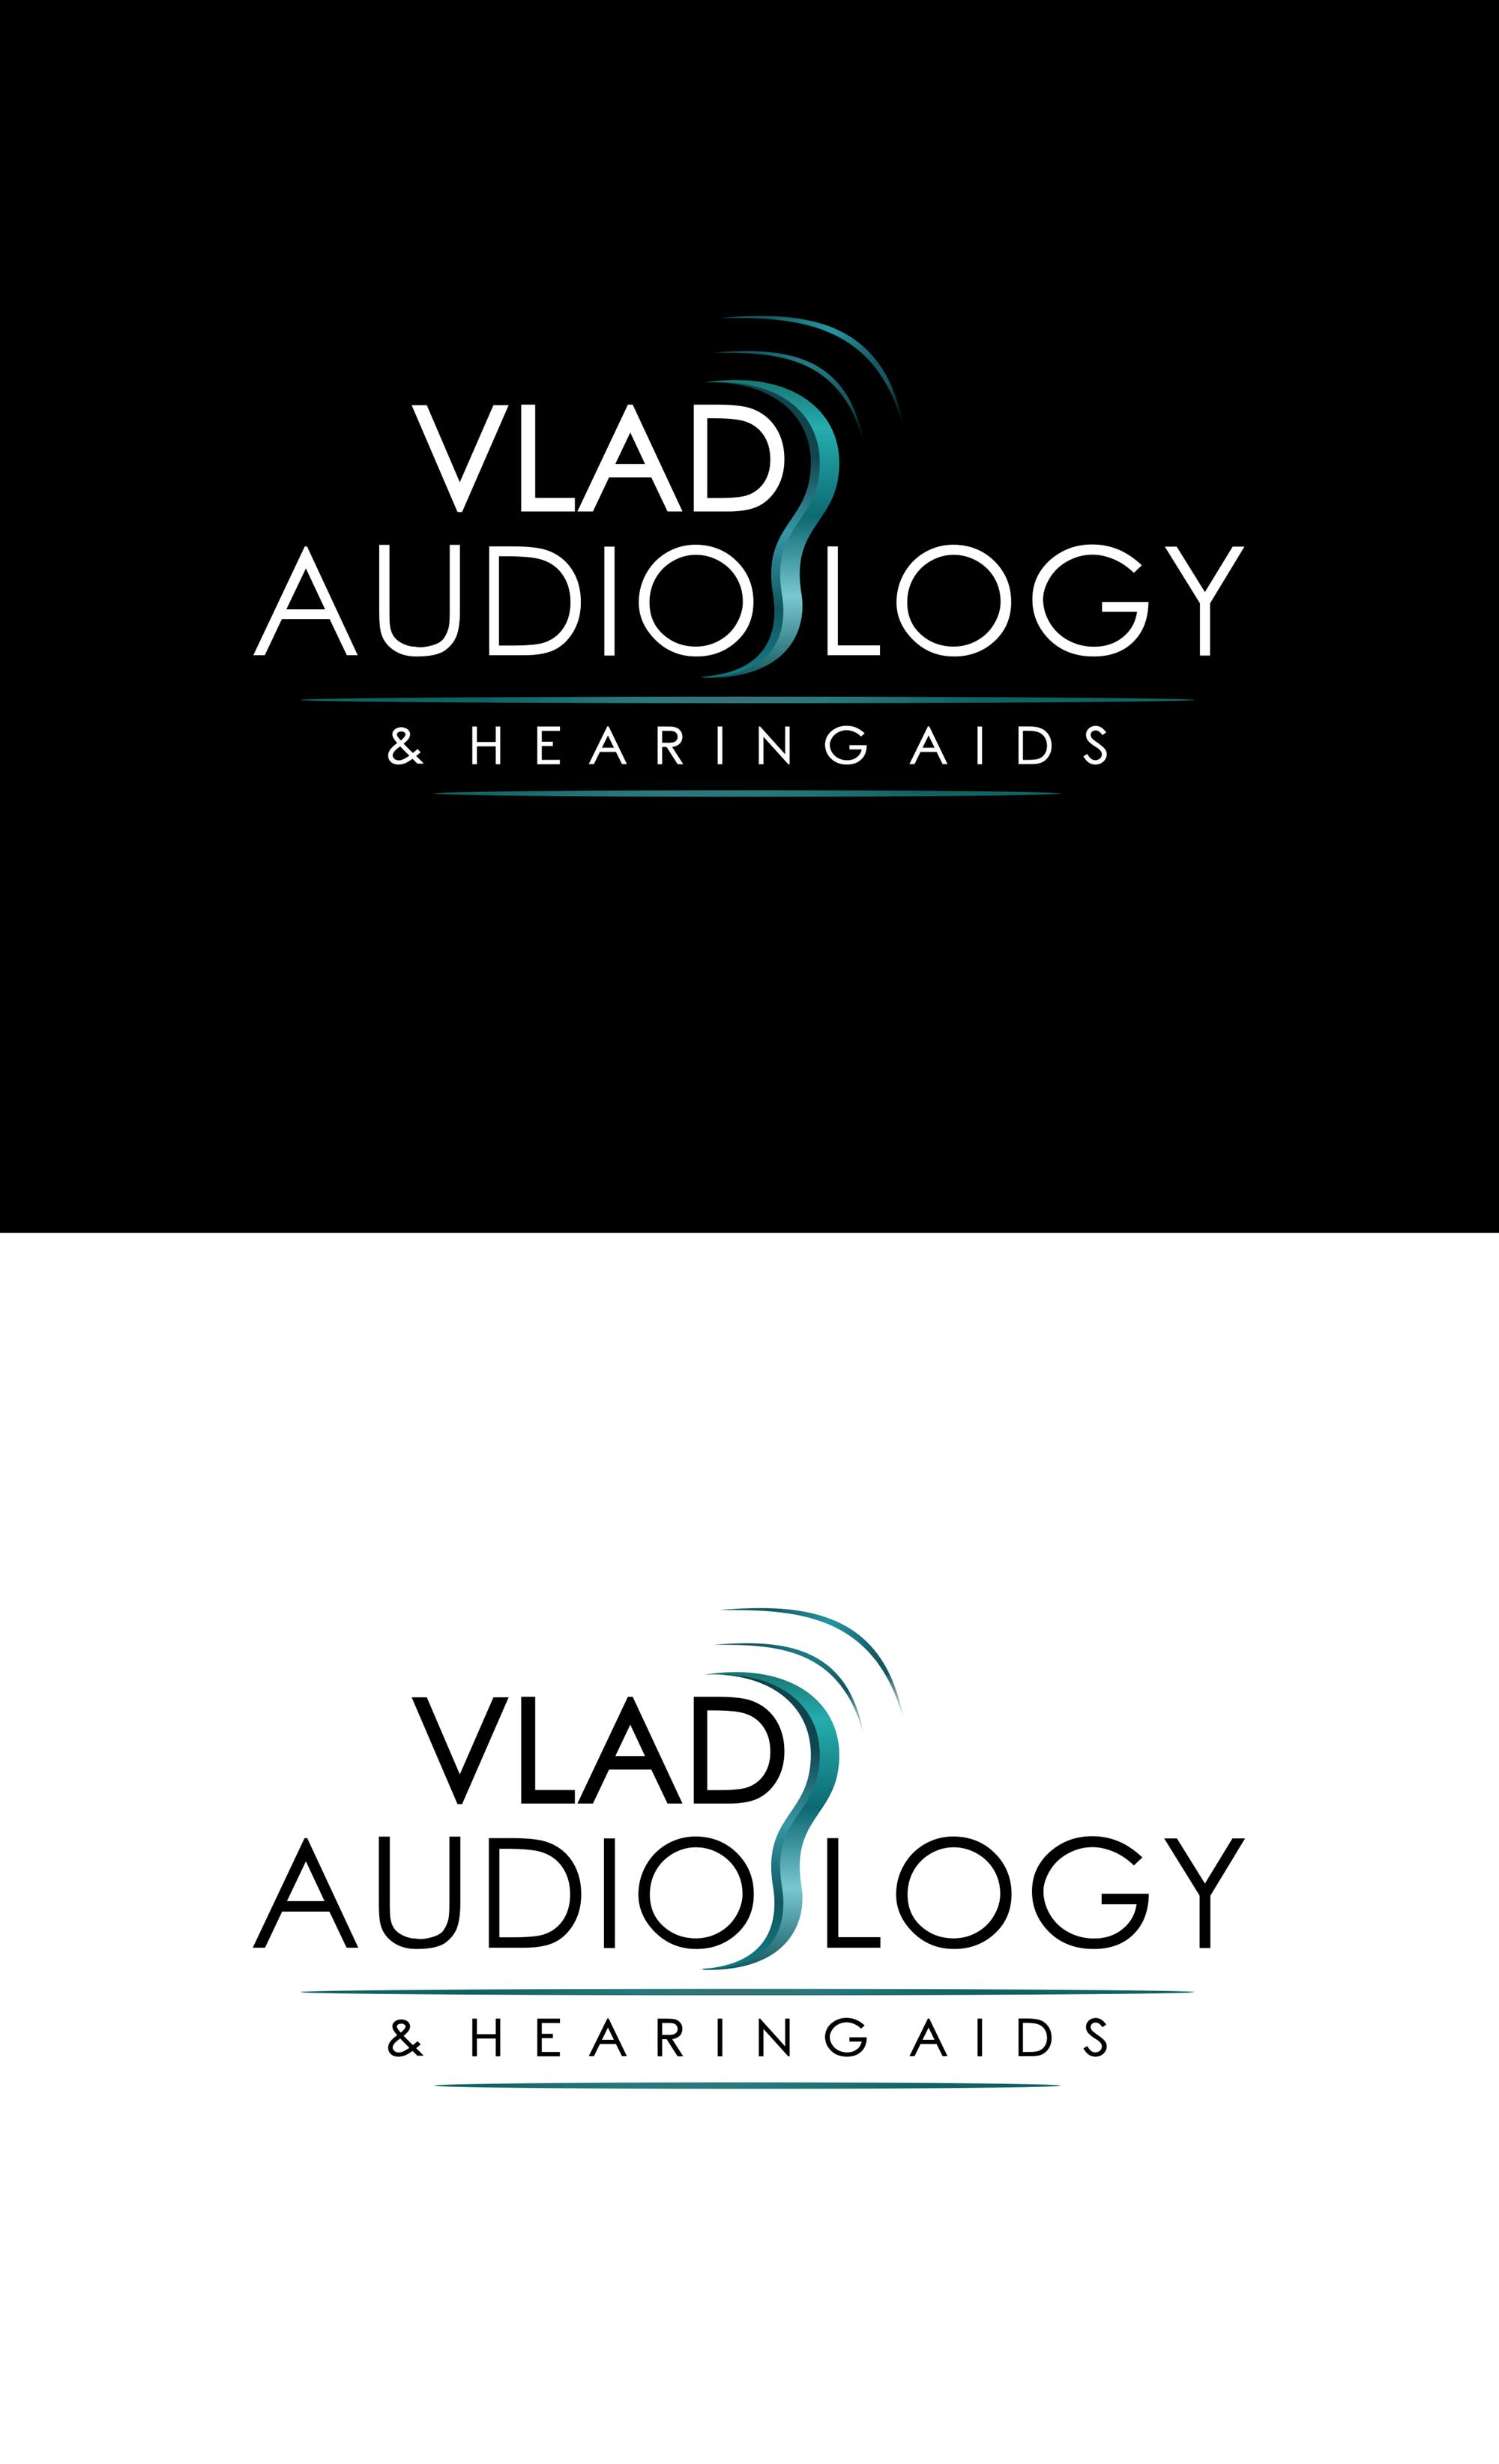 Help me brand my hearing clinic!